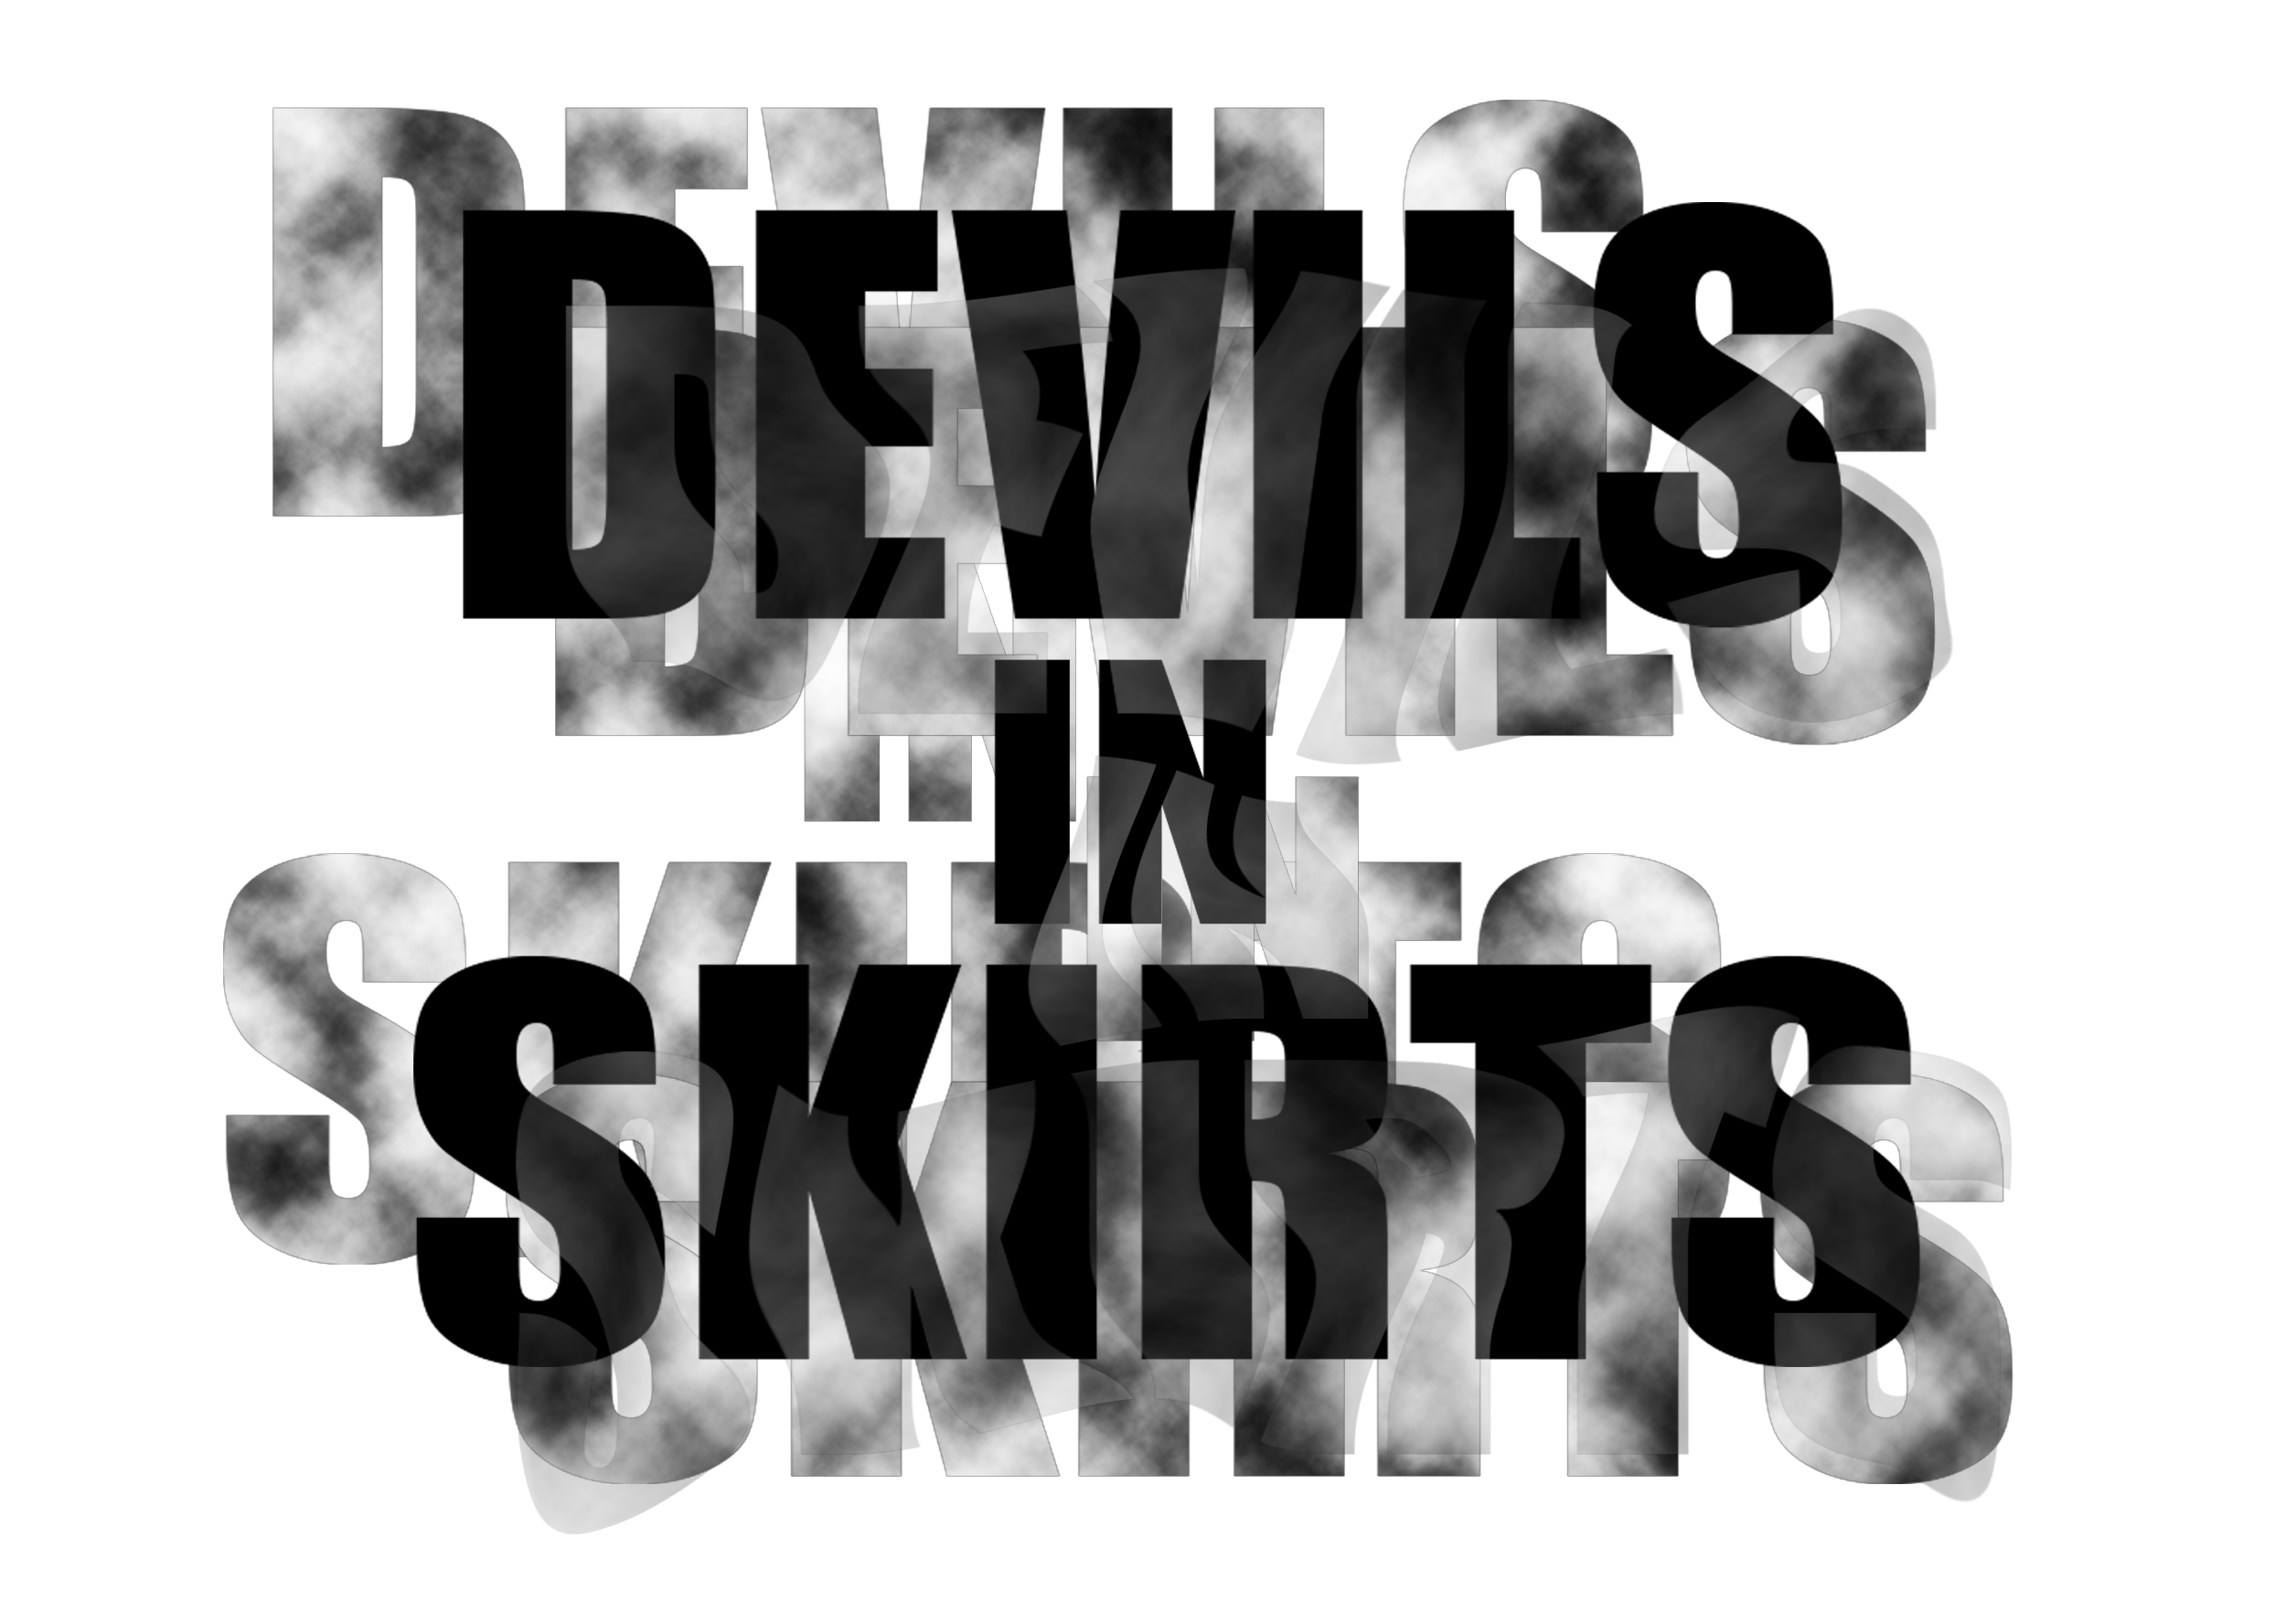 t shirt devils.png